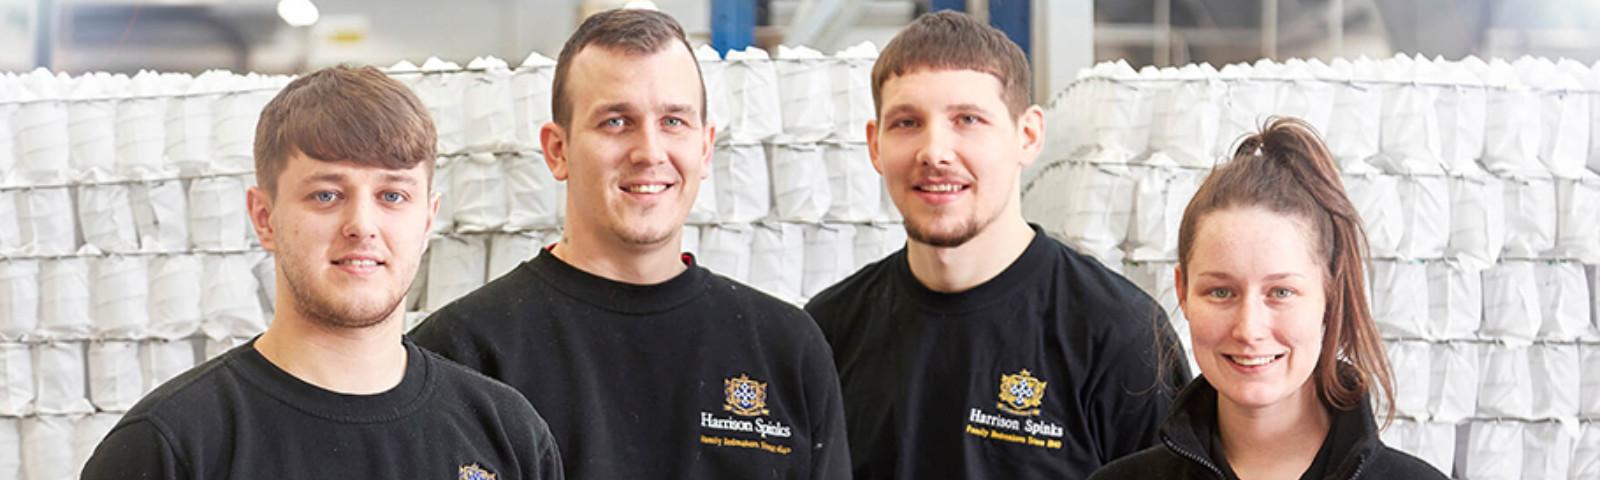 Apprentices Header 180621 095930